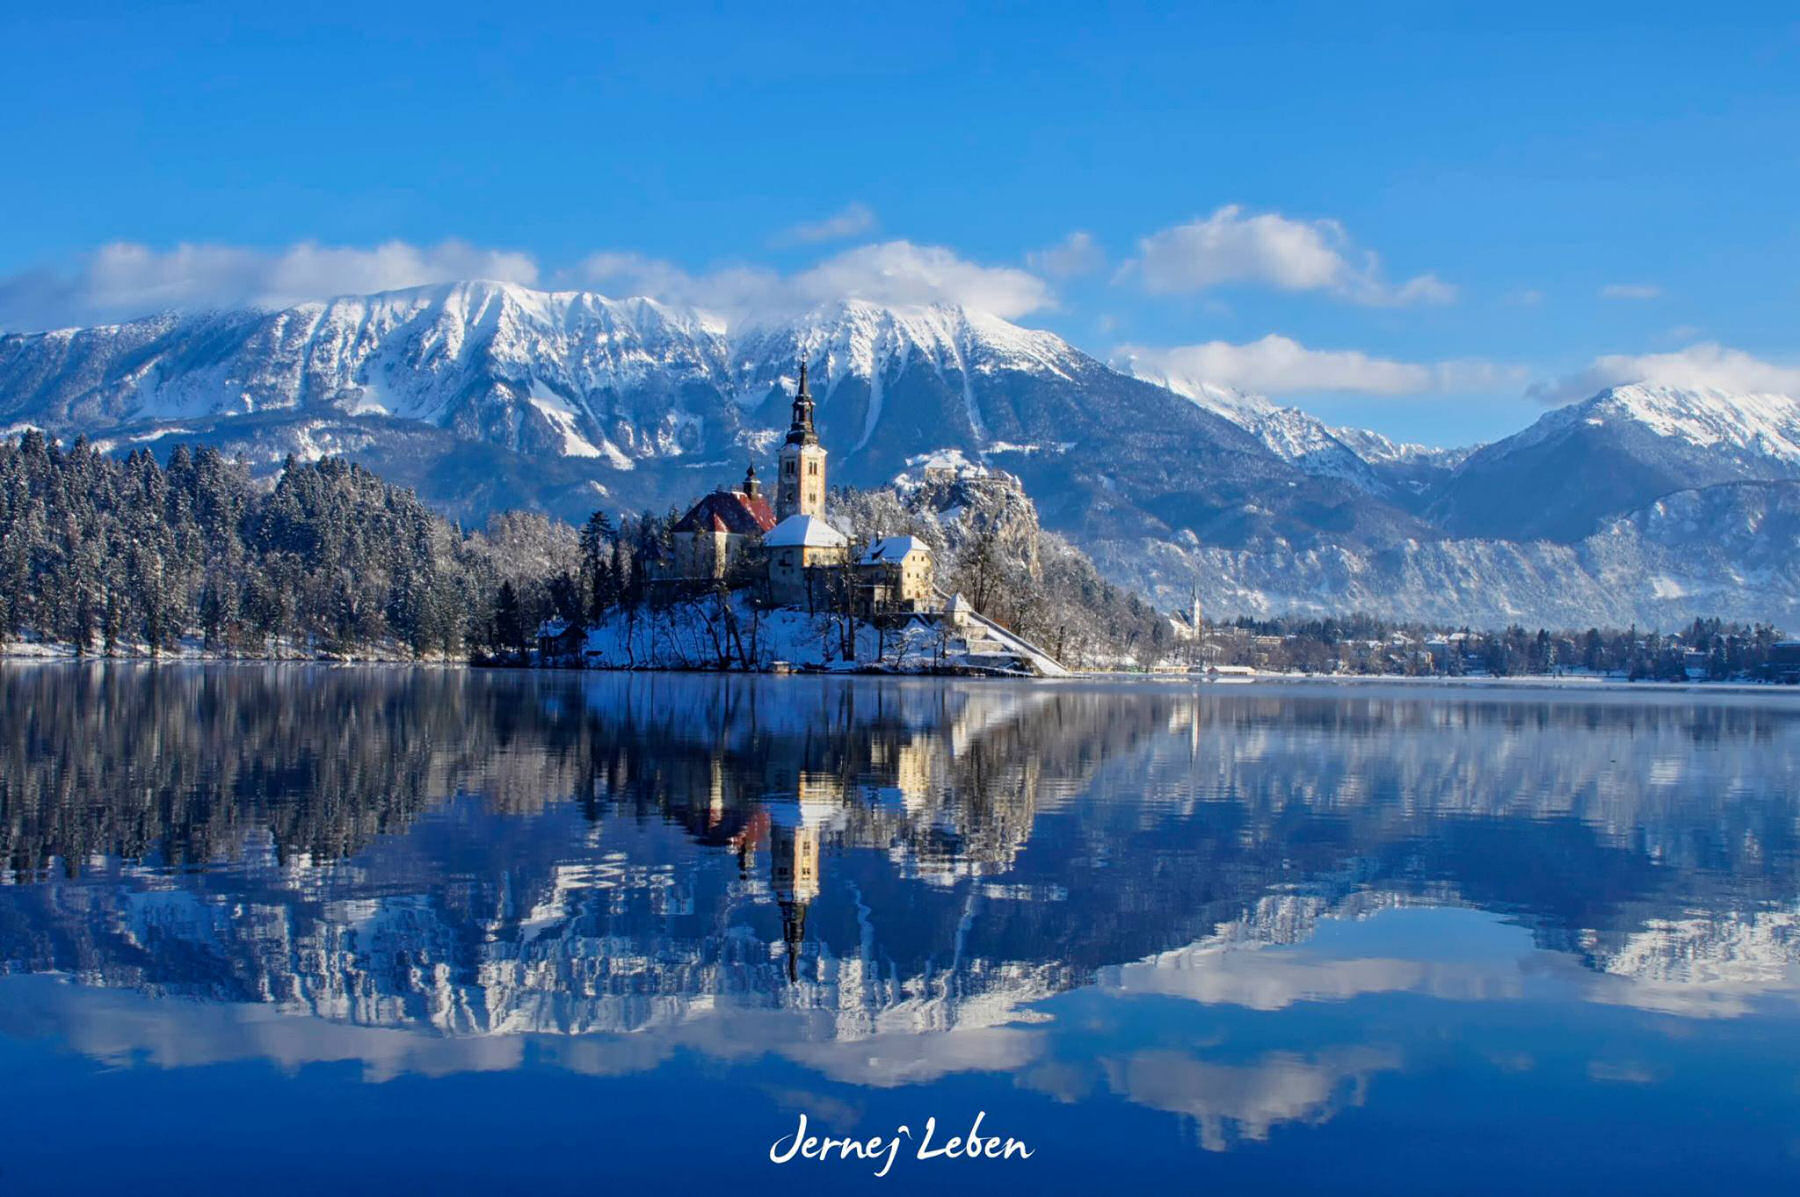 40 Beautiful Photos From Around Slovenia By Jernej Leben